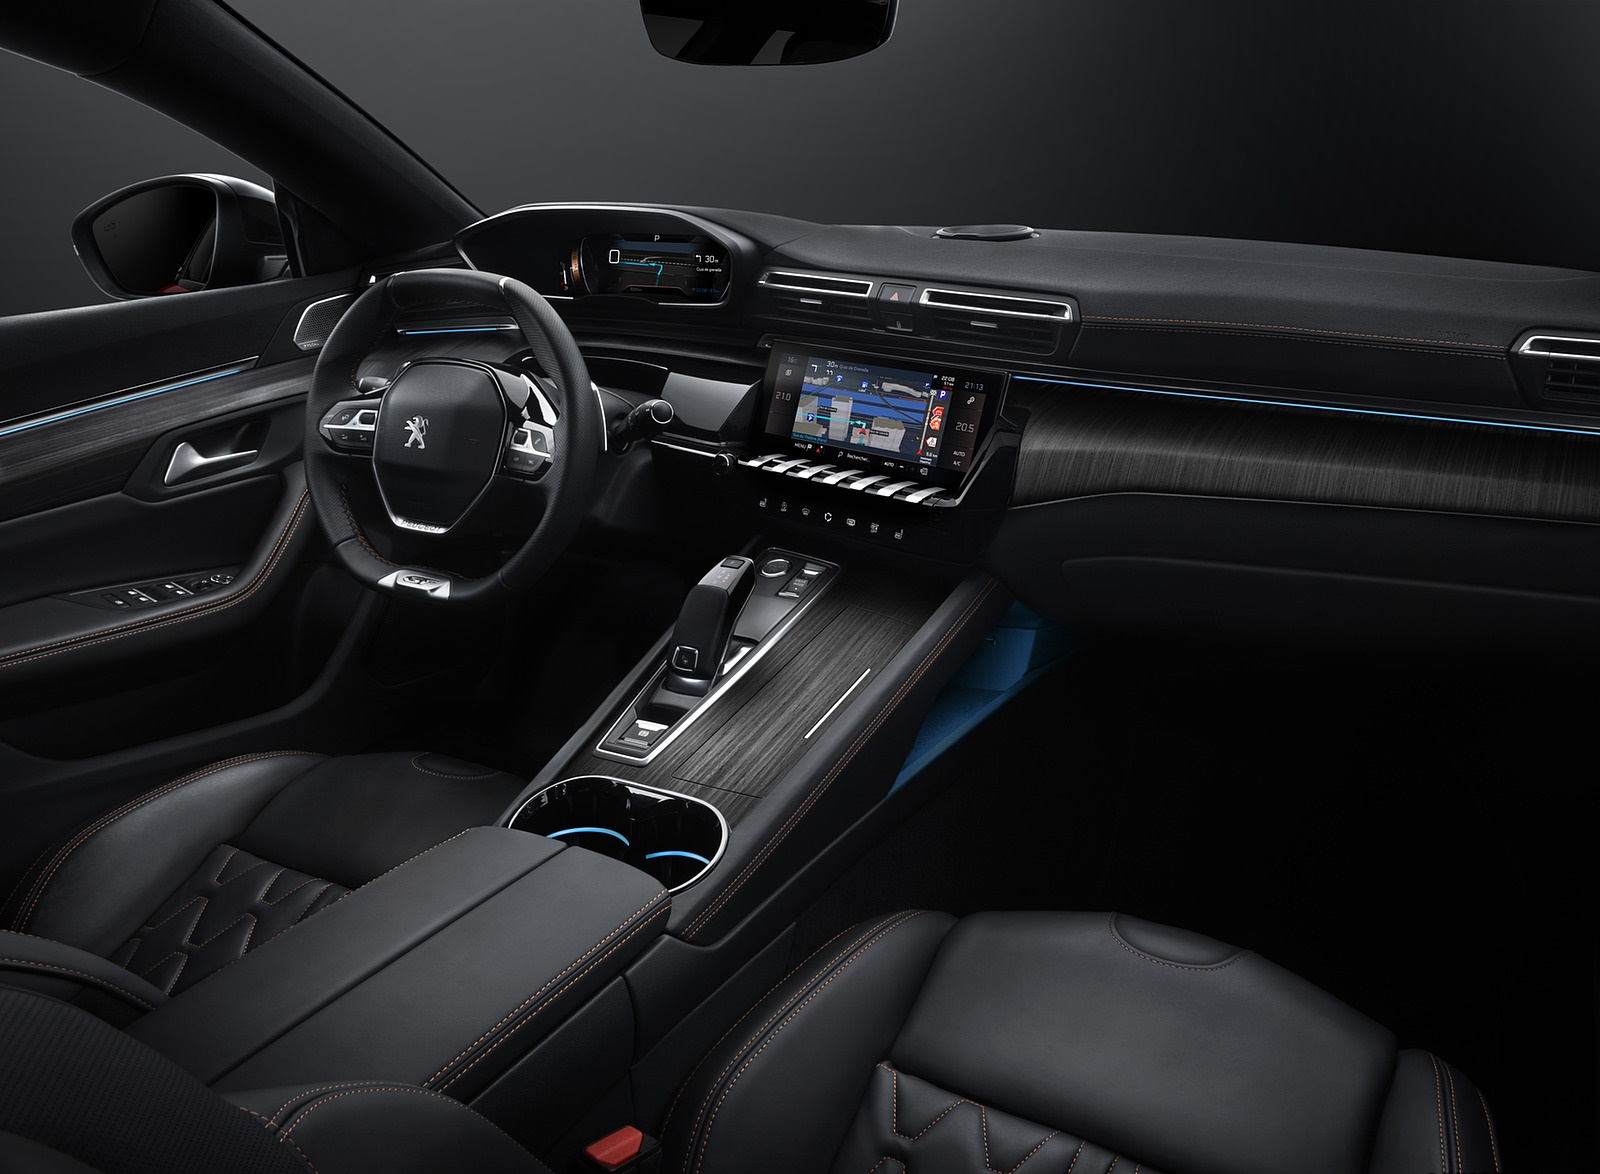 2019 Peugeot 508 Interior Wallpapers (6)